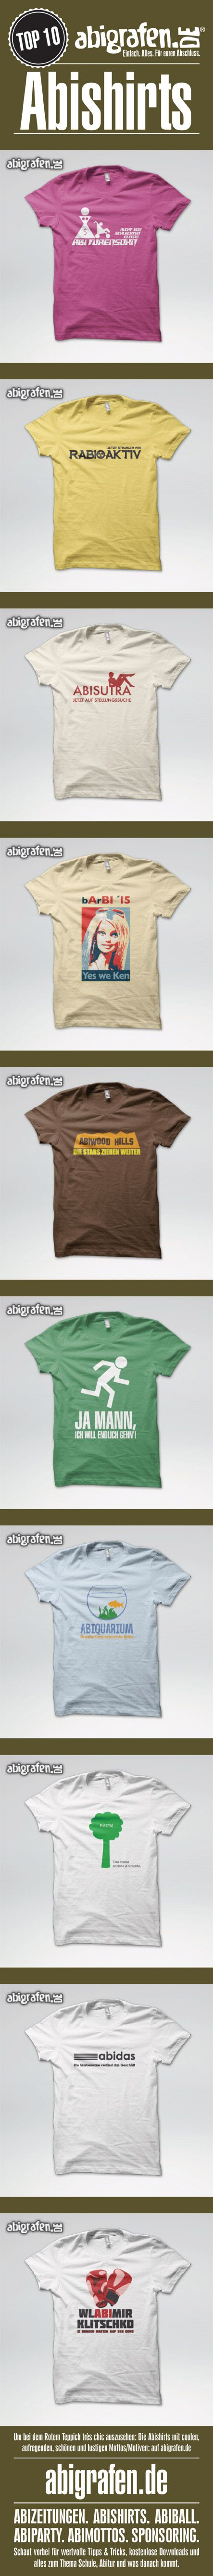 #Abishirts #Tshirts #Abschlussshirts #Abishirt #T-Shirt #Abikleidung #Abifashion